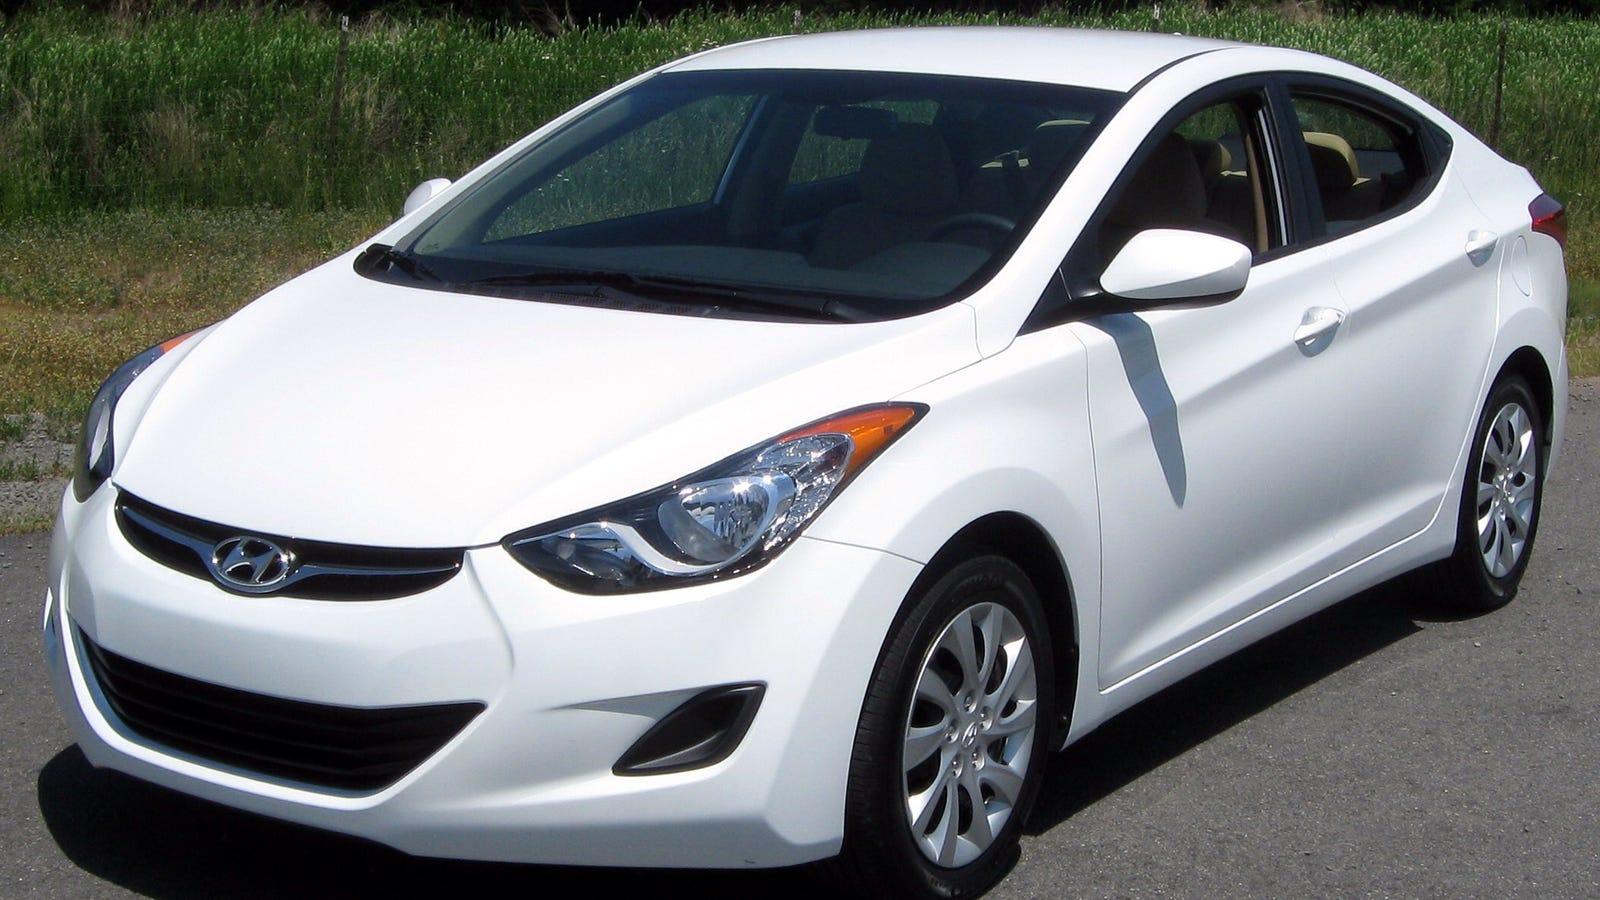 Driving Instructor Car Rental